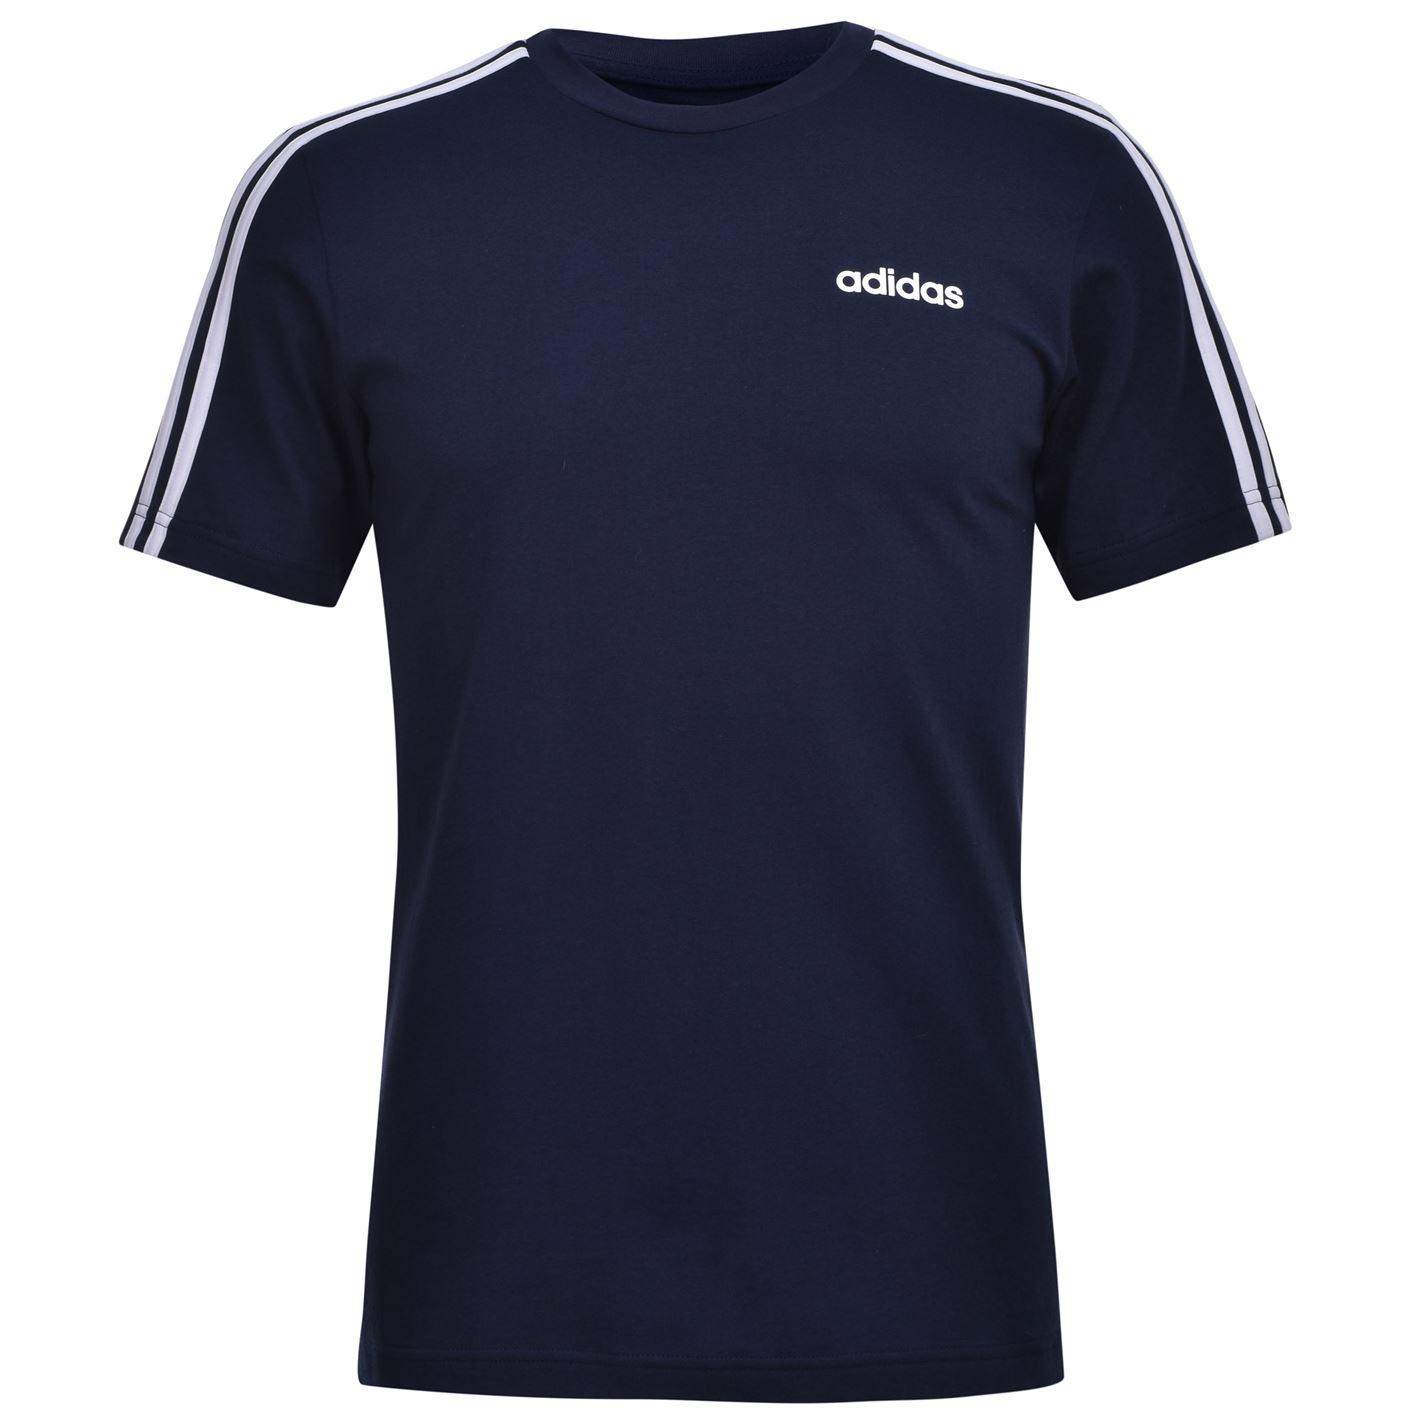 Adidas Essentials 3-Stripes Mens T-Shirt